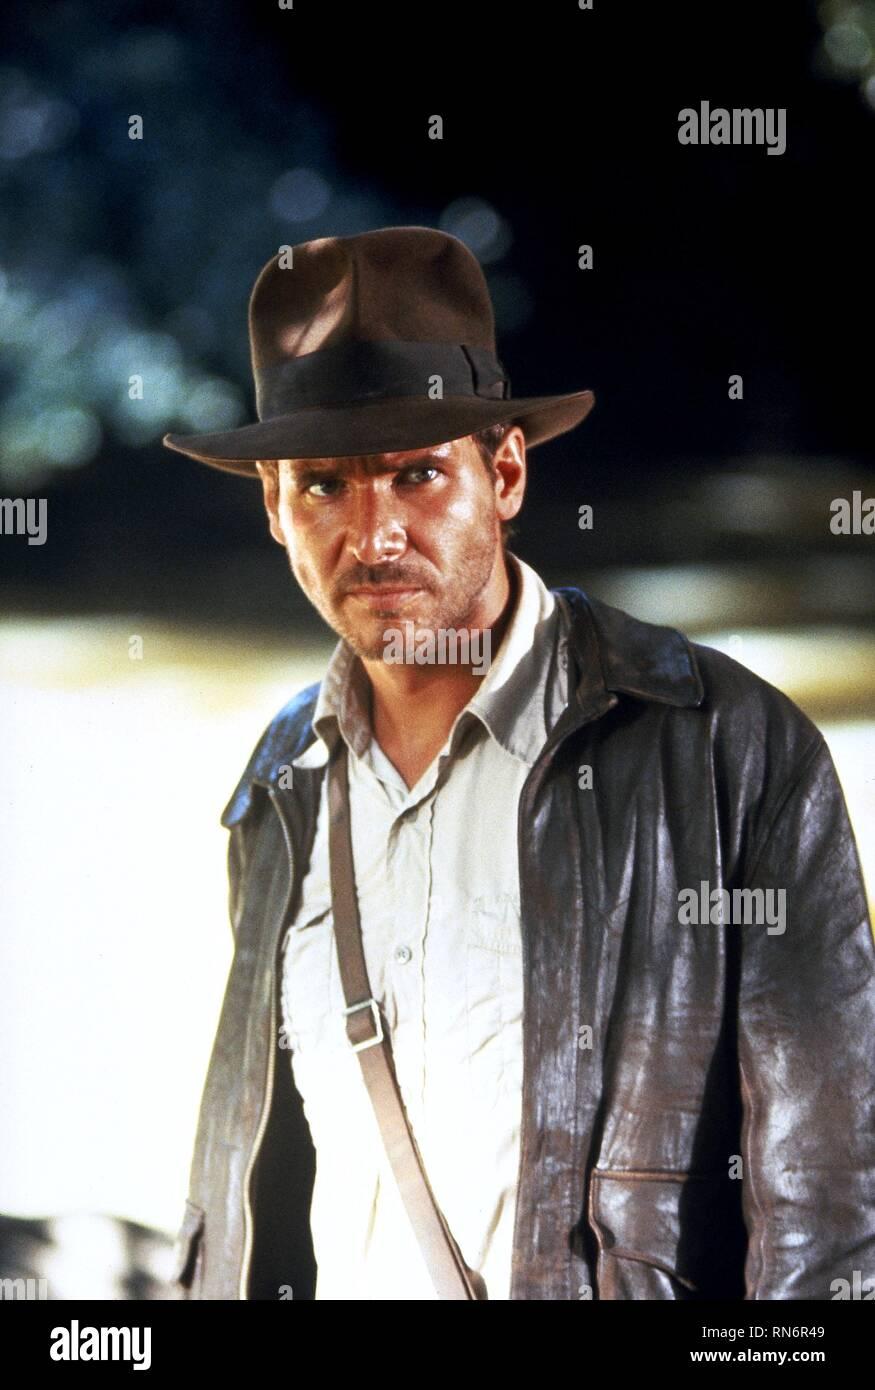 ce5315722c56d Indiana Jones Raiders Of The Lost Ark Stock Photos   Indiana Jones ...